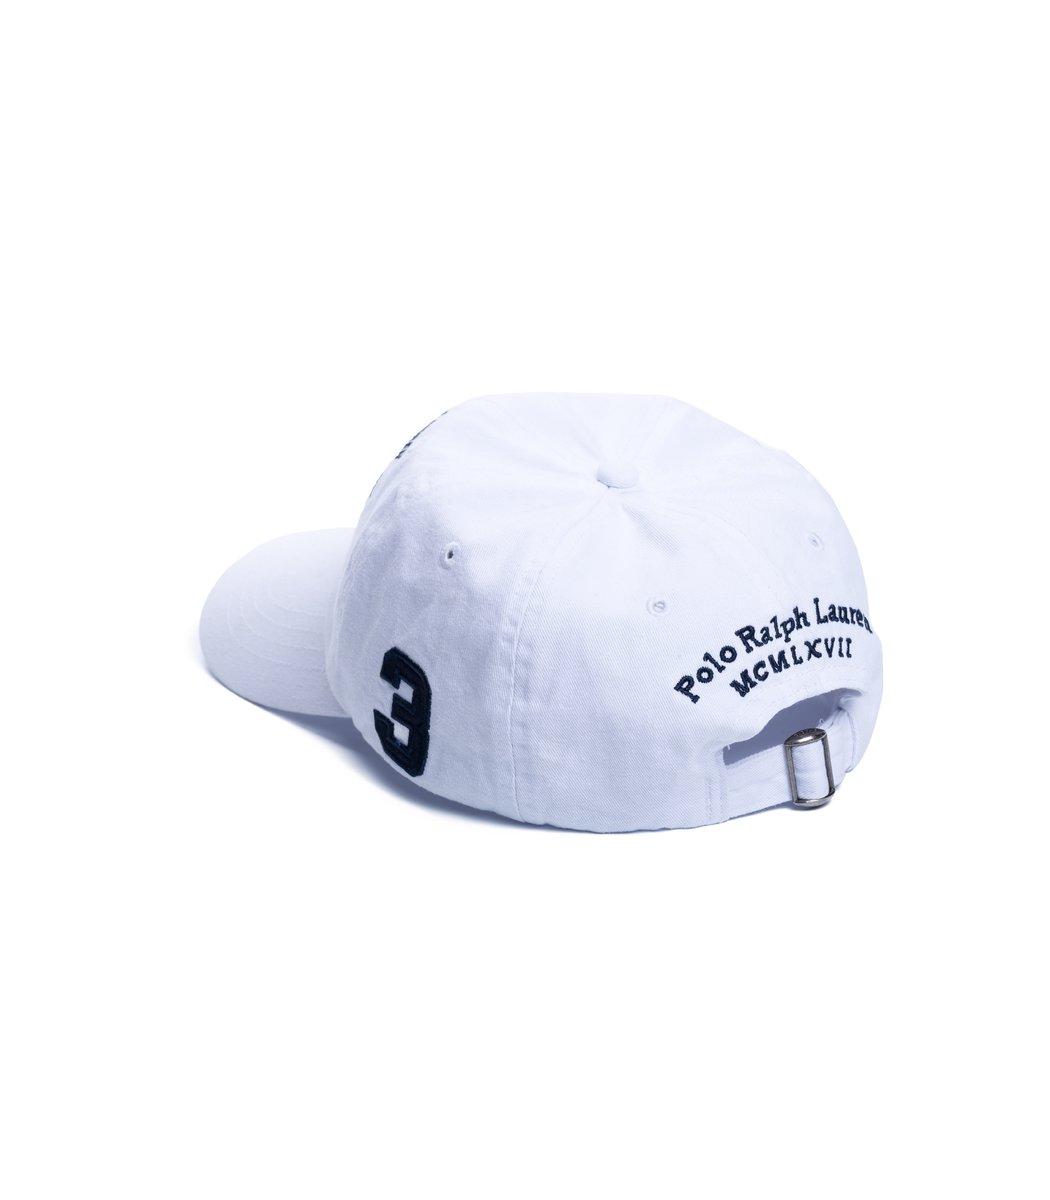 Кепка POLO Ralph Lauren Classic 6 Белый/синий - Белый - Вид 2